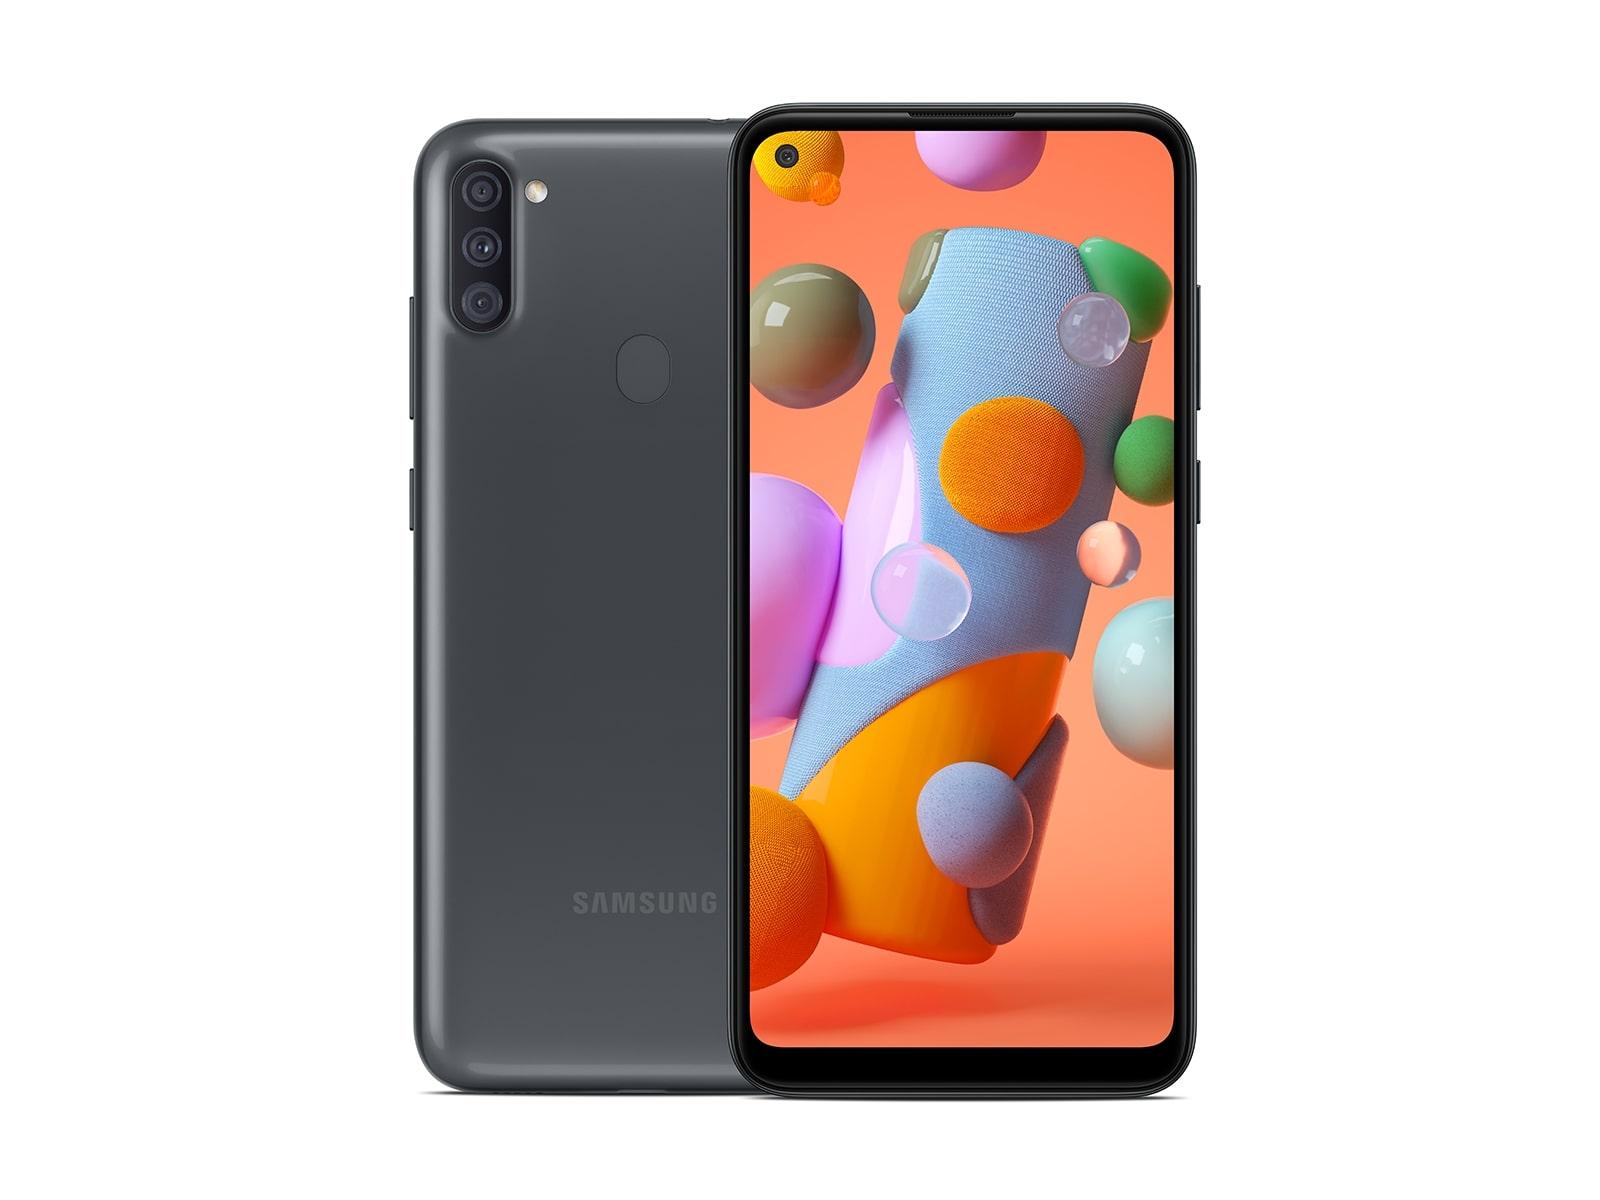 Samsung Galaxy A11 Design